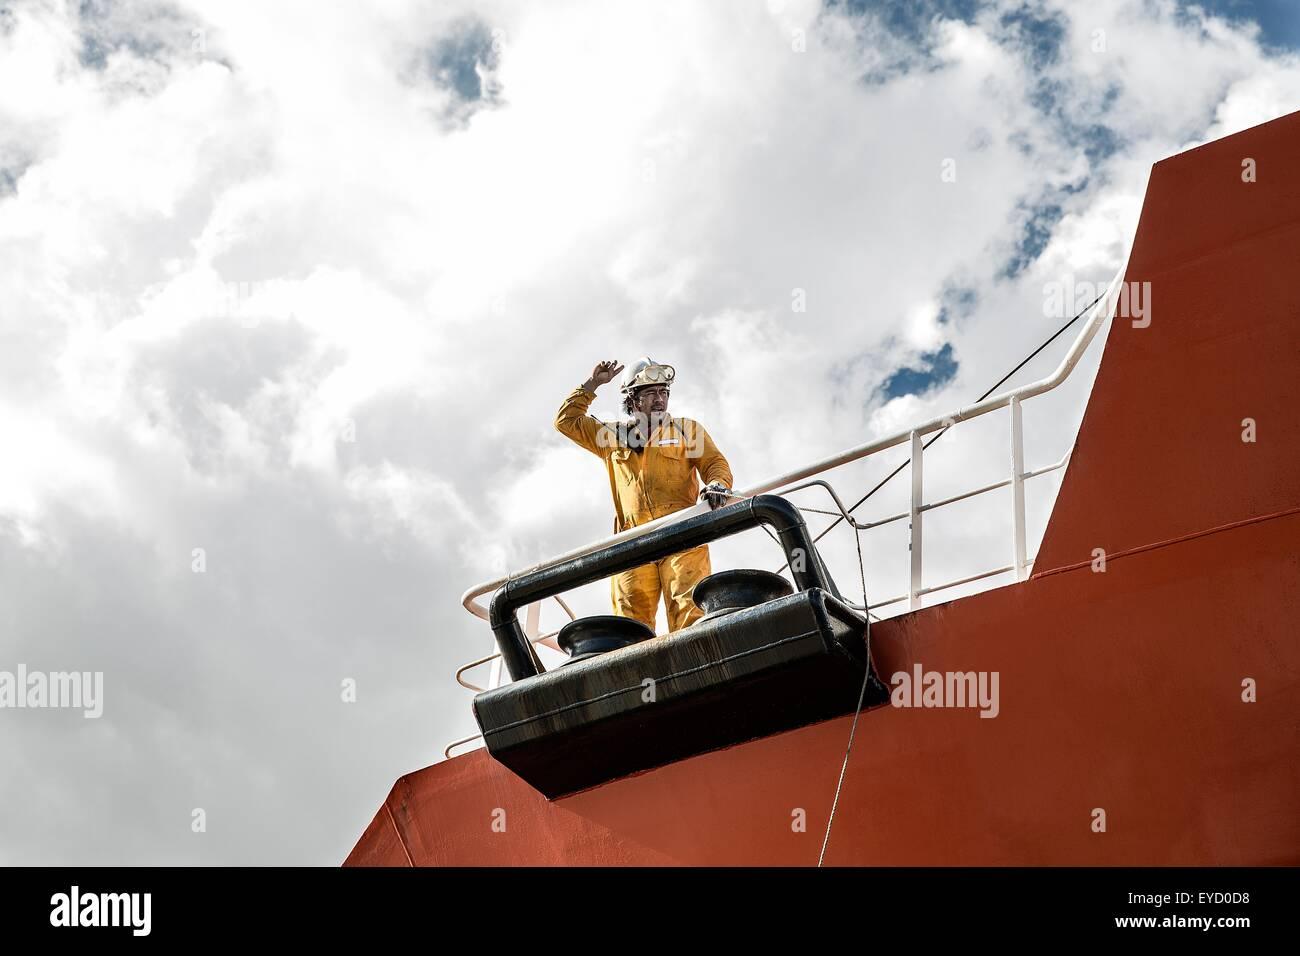 Worker mooring oil tanker on deck making hand gesture Stock Photo